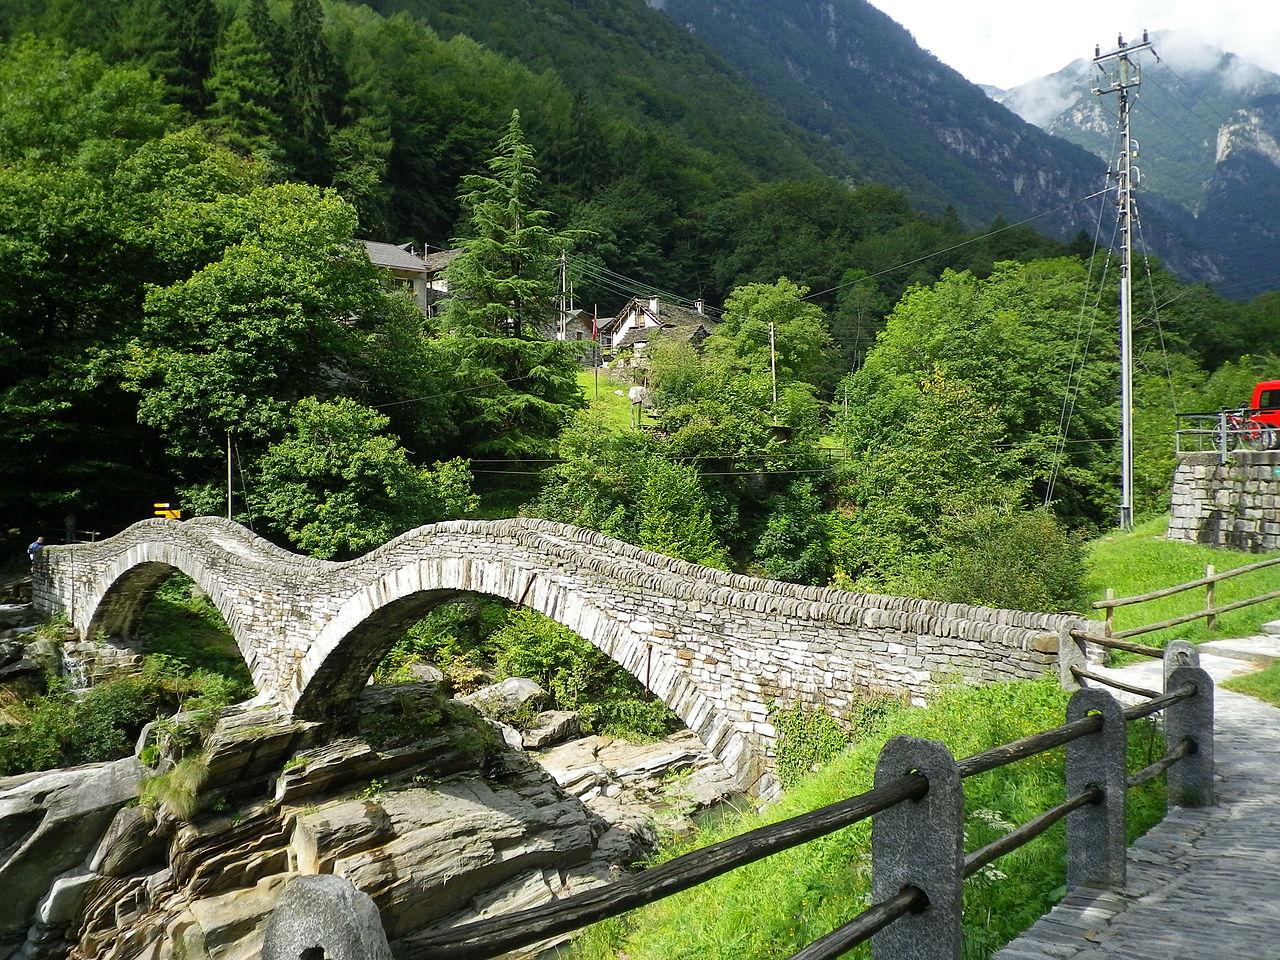 http://upload.wikimedia.org/wikipedia/commons/thumb/8/8a/Roman_era_stone_arch_bridge,_Ticino,_Switzerland.JPG/1280px-Roman_era_stone_arch_bridge,_Ticino,_Switzerland.JPG